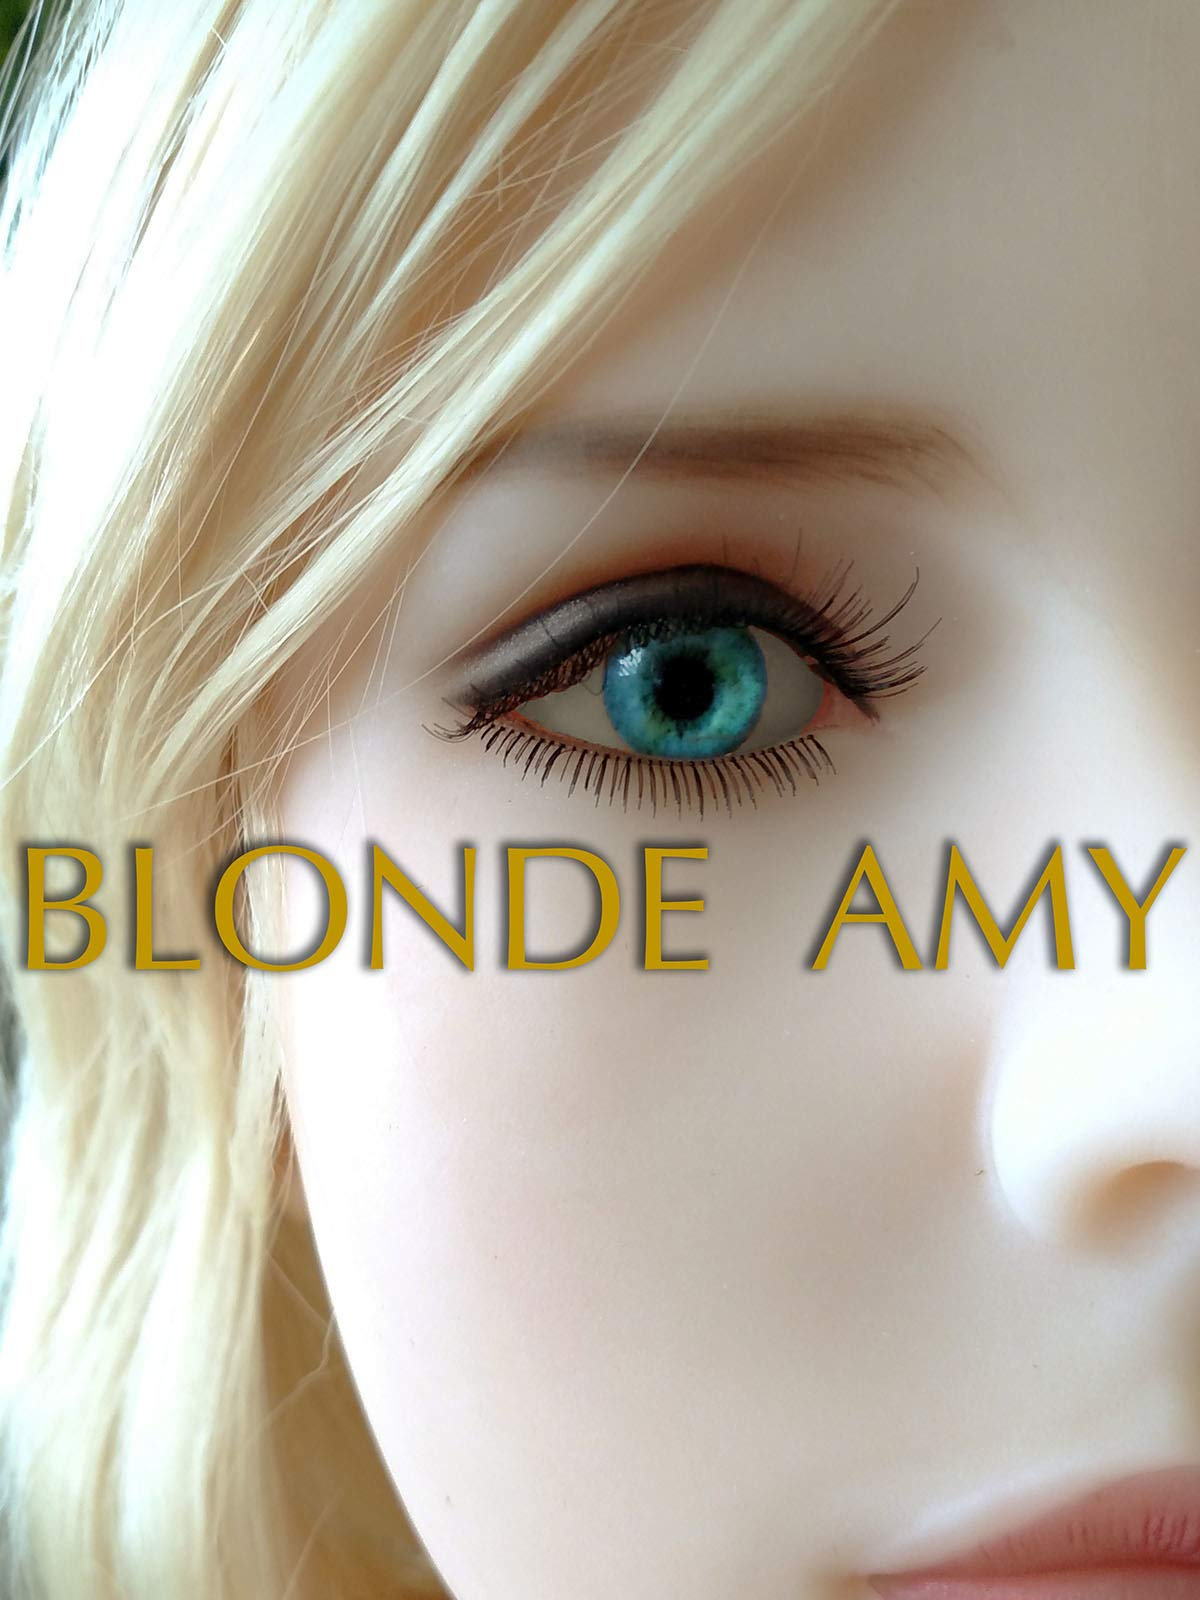 Blonde Amy on Amazon Prime Video UK